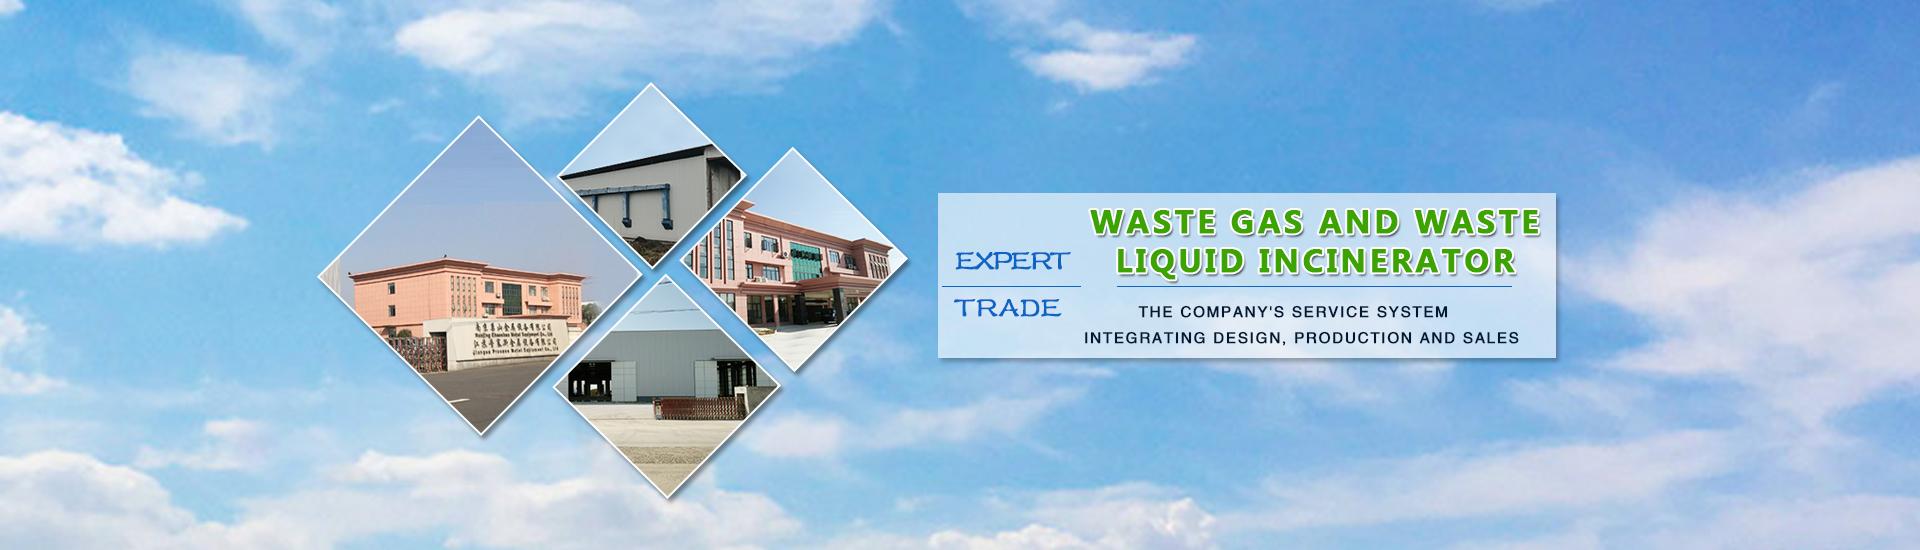 Waste gas and waste liquid incinerator